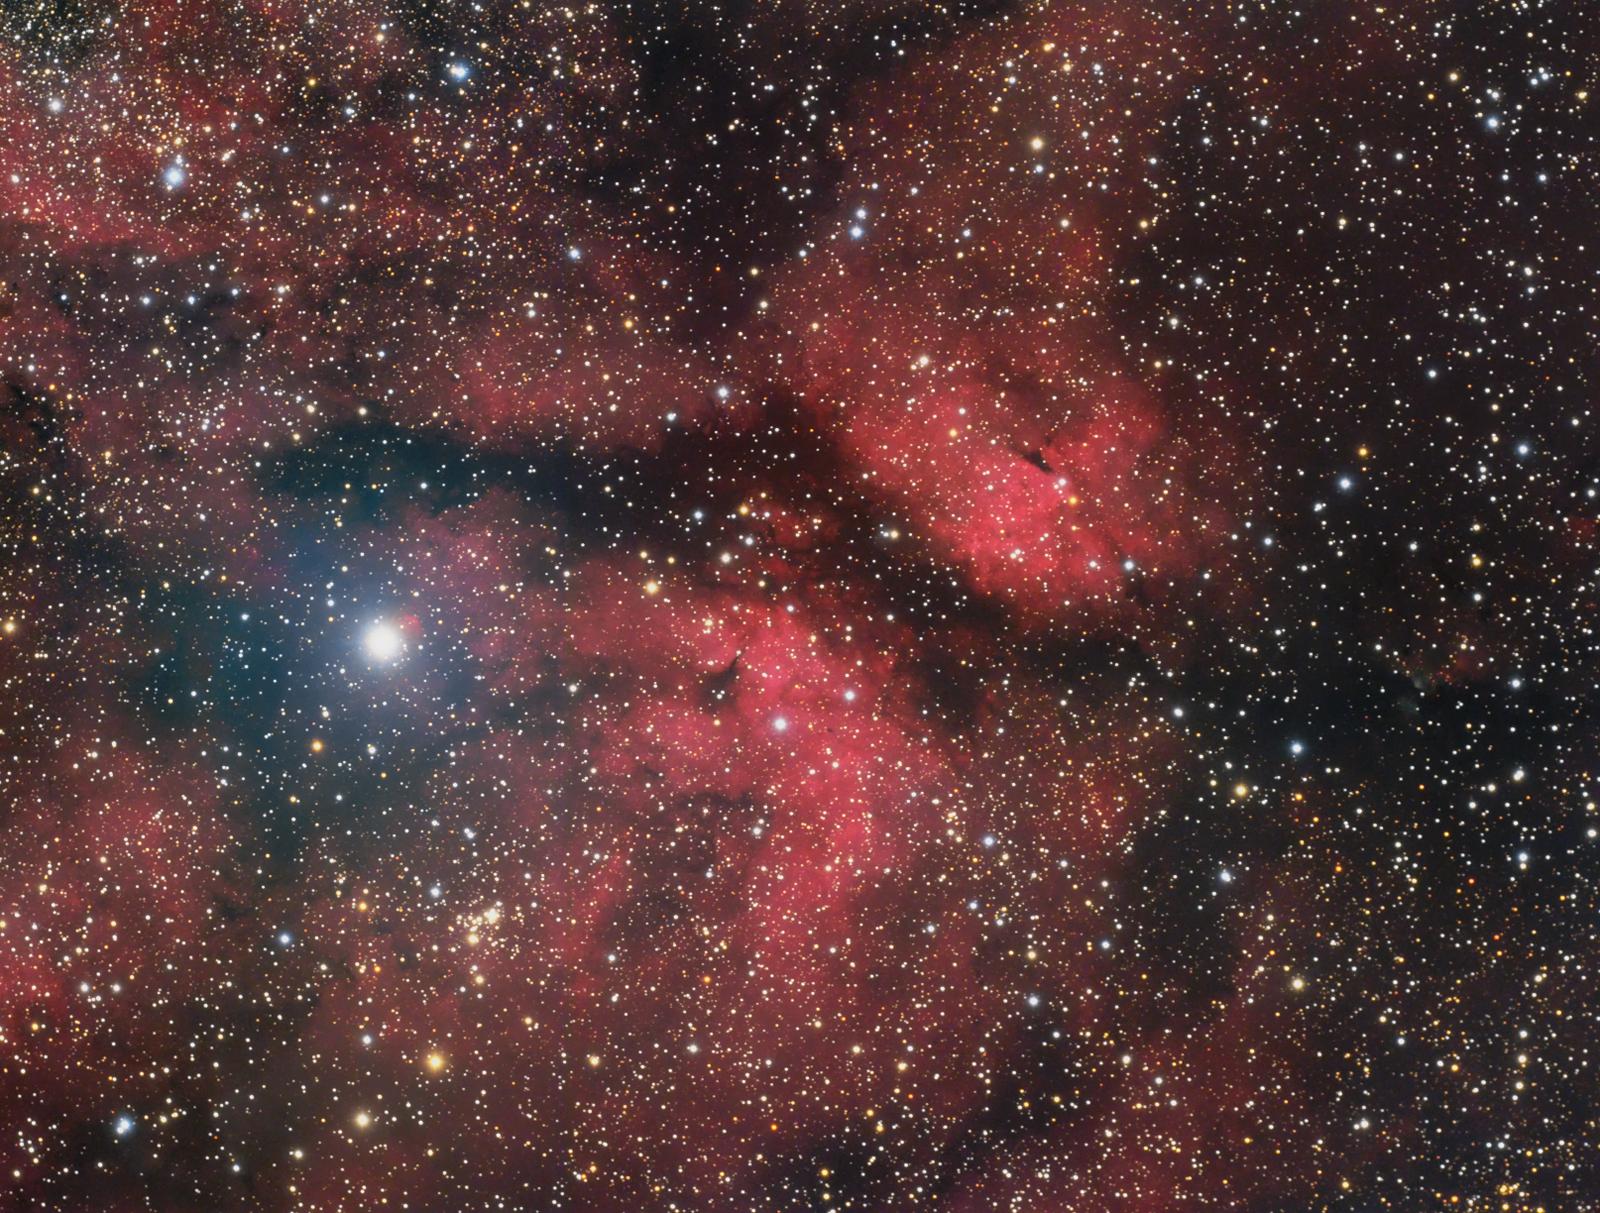 sadr-region-gamma-cygni-nebula-1600x1200.jpg